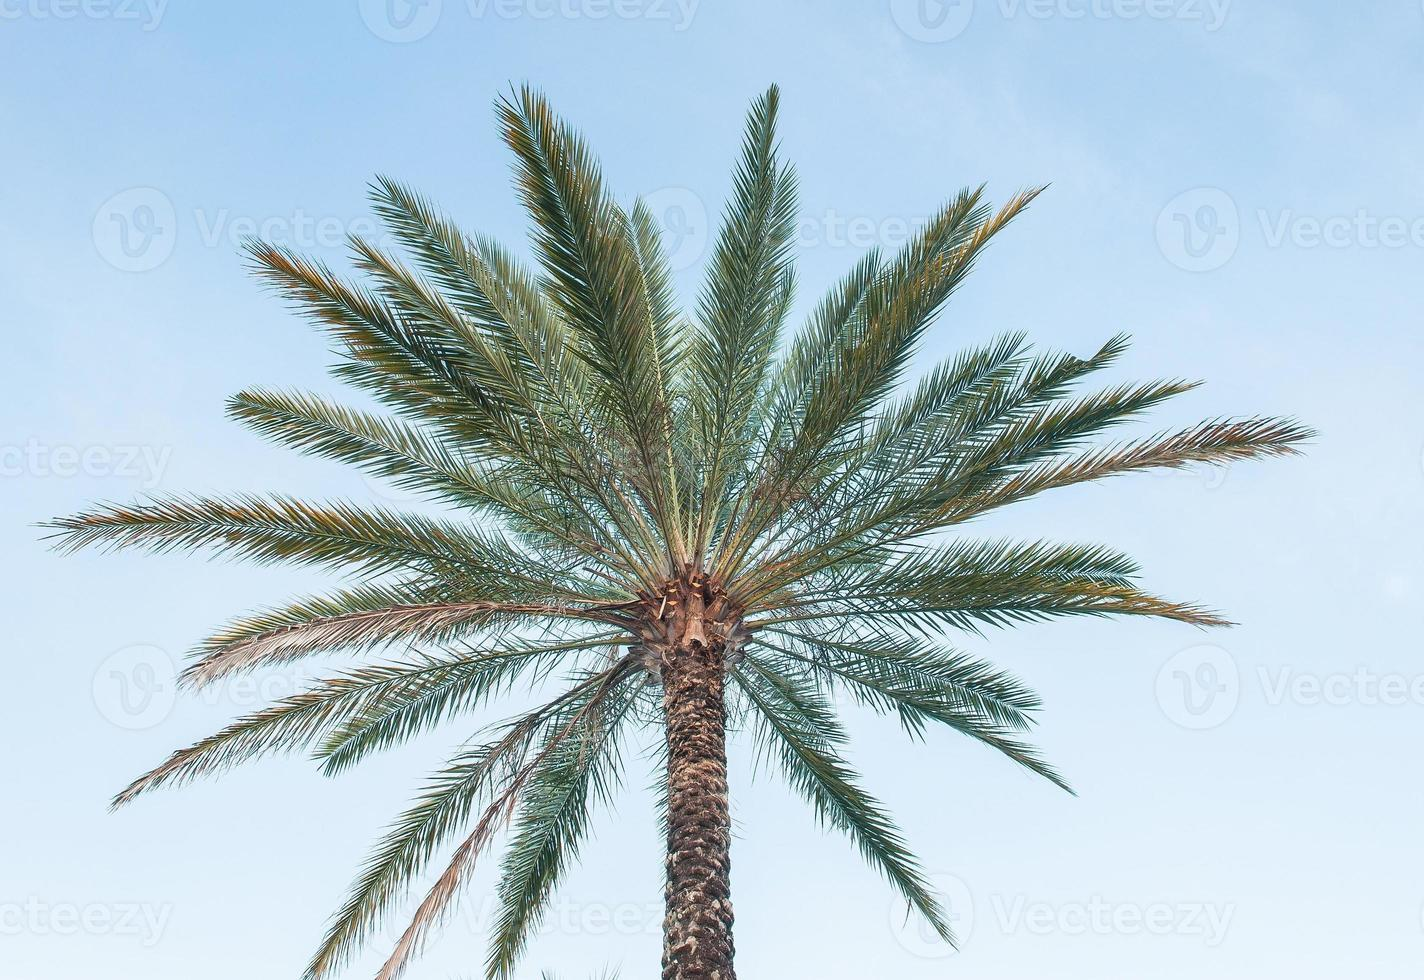 PalmTree with blue sky photo